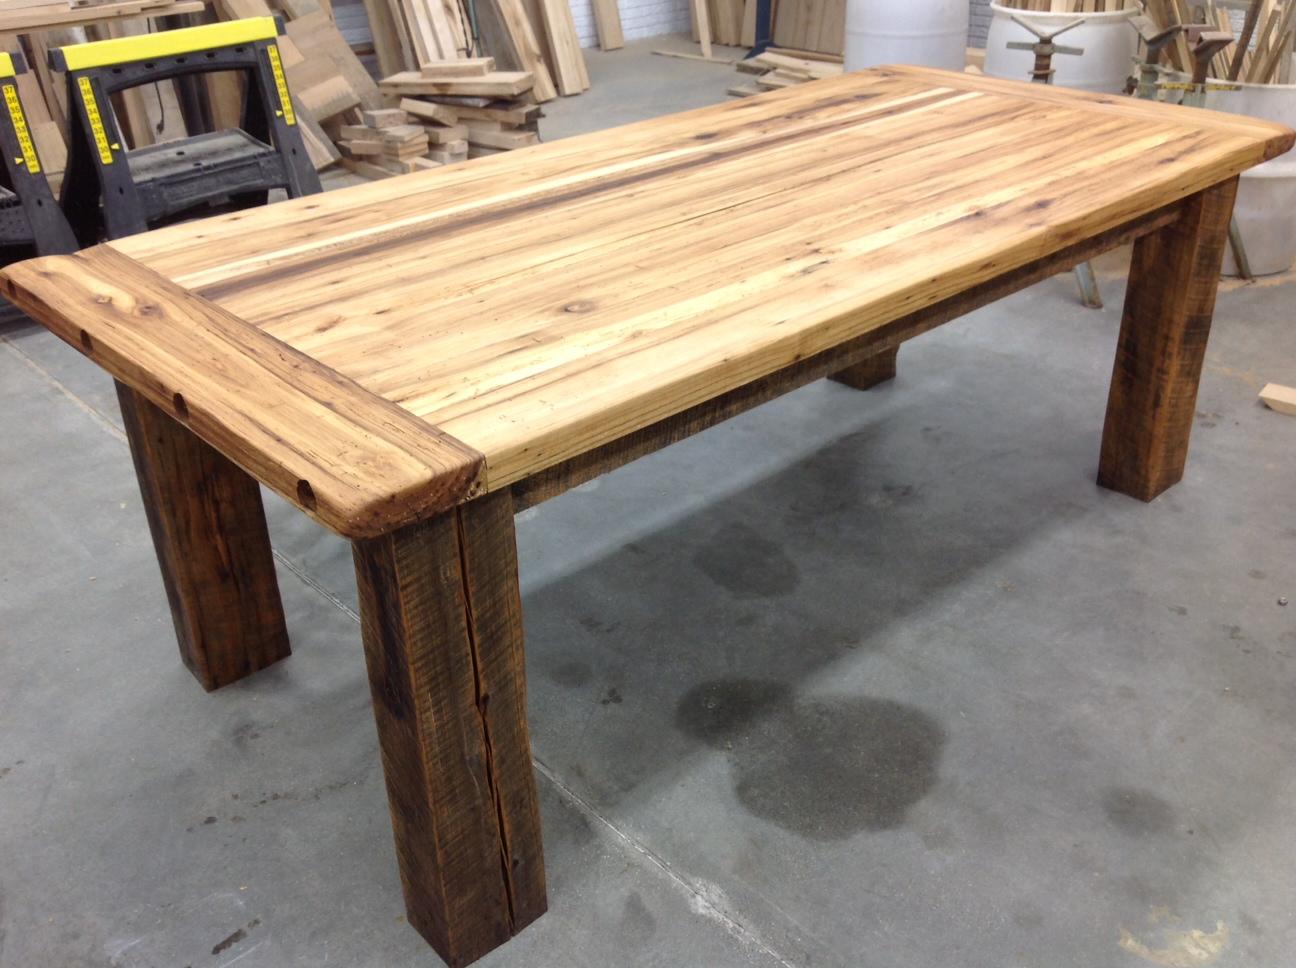 http://cdn2.hubspot.net/hub/263712/file-699966623-jpg/gallery/album/13568/hickory-farm-table-side-left-reclaimed-wood-michigan.jpg?t=1530896581013